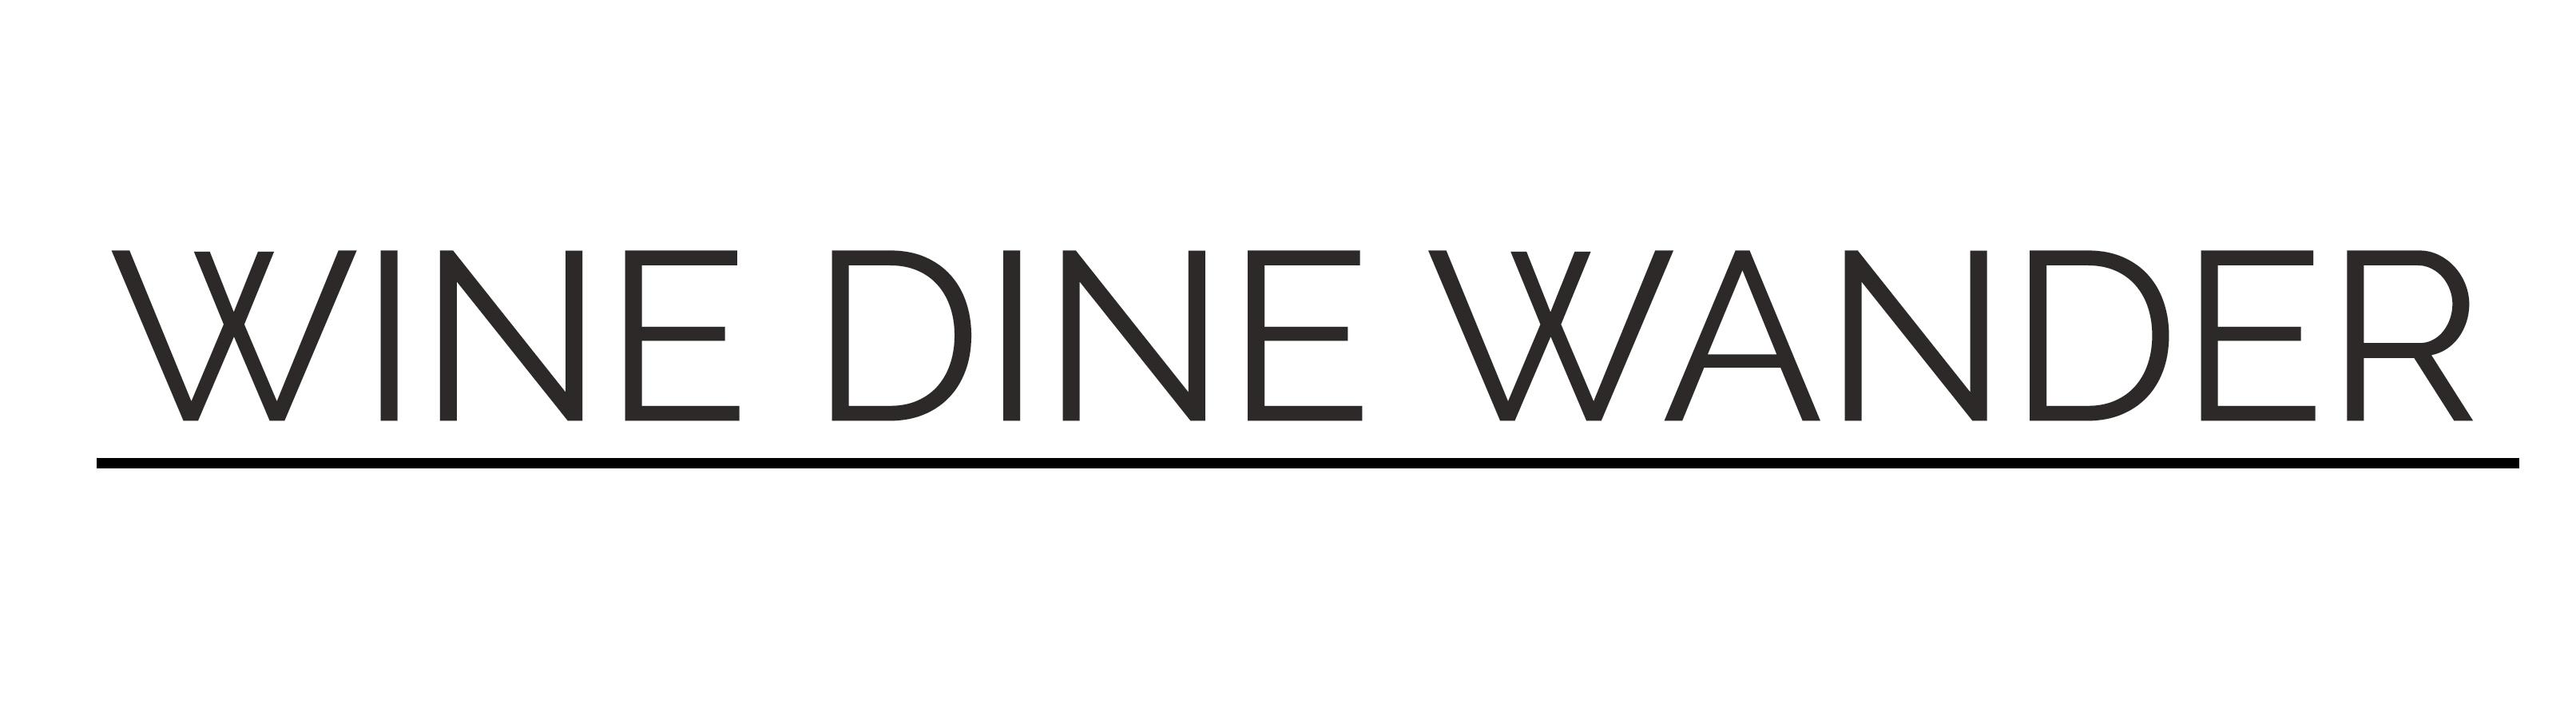 Wine Dine Wander